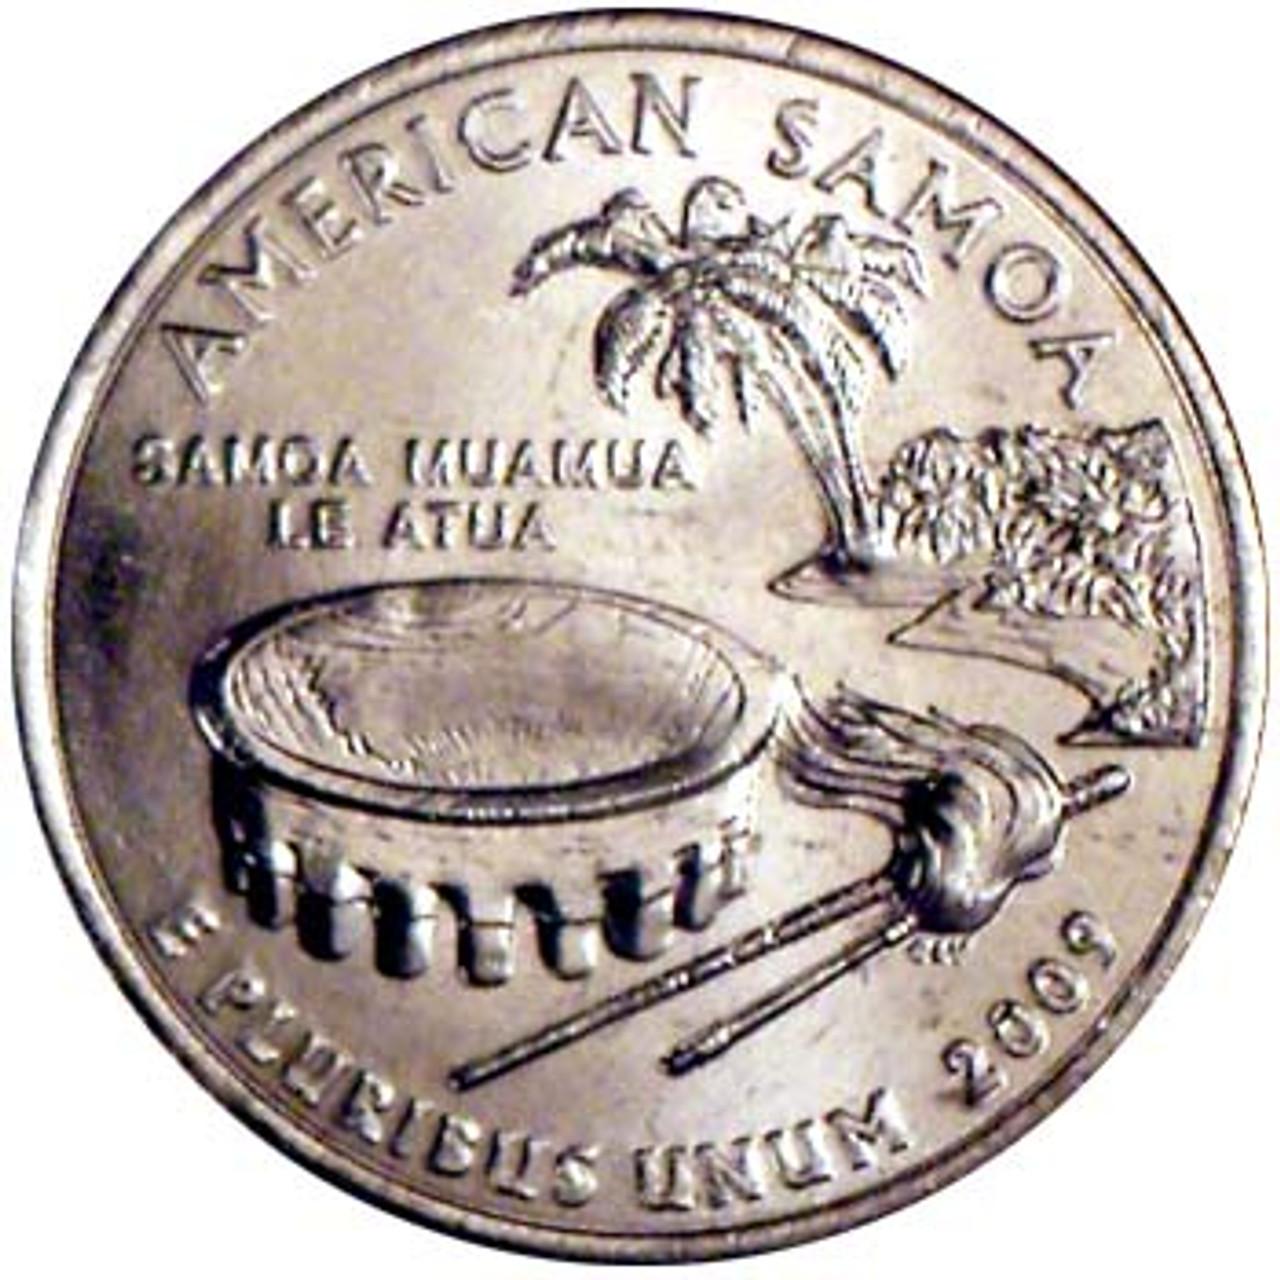 2009-P American Samoa Quarter Brilliant Uncirculated Image 1